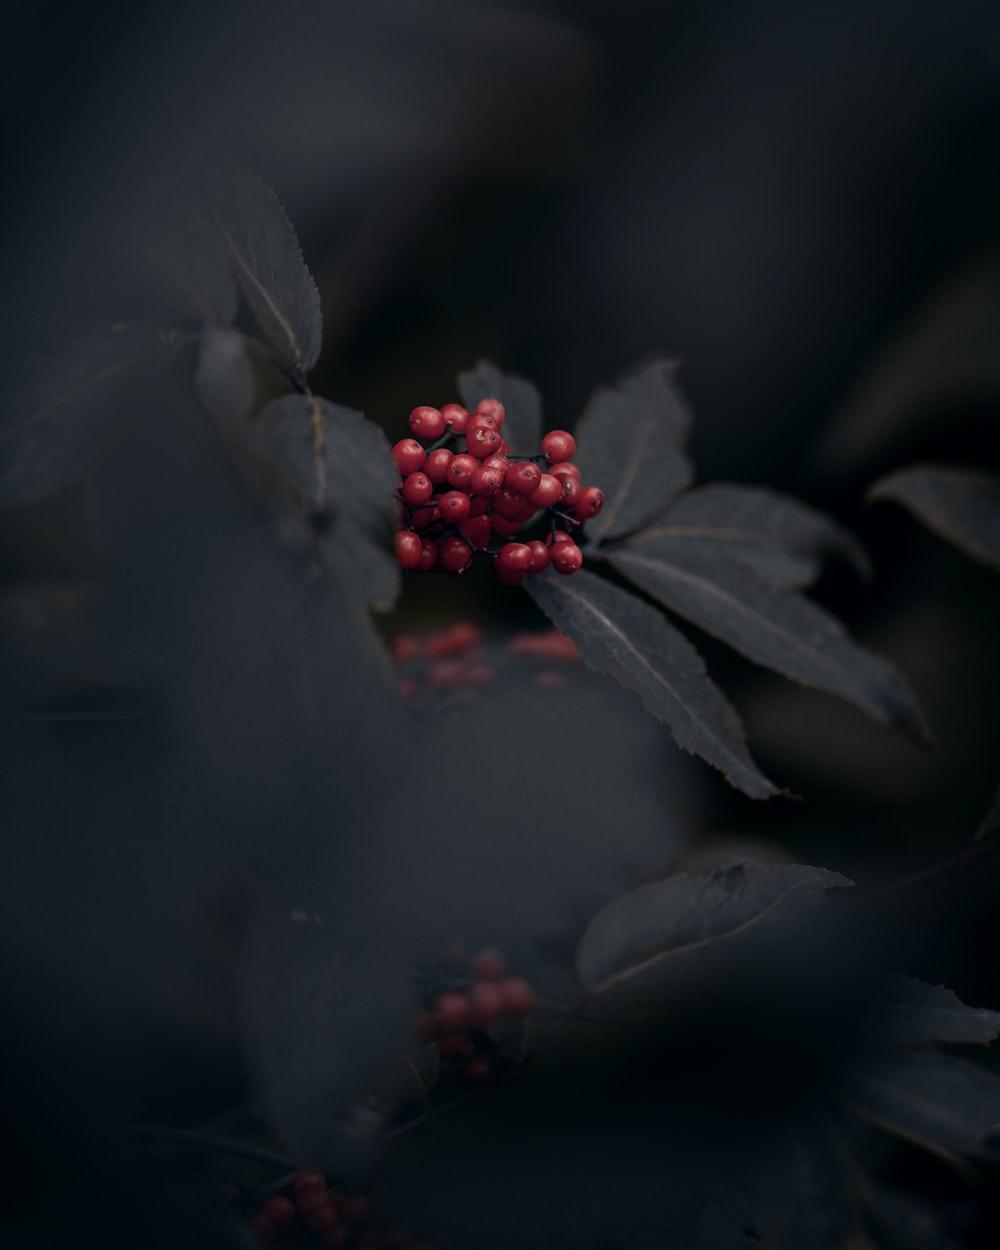 View the photo by Kirill Pershin